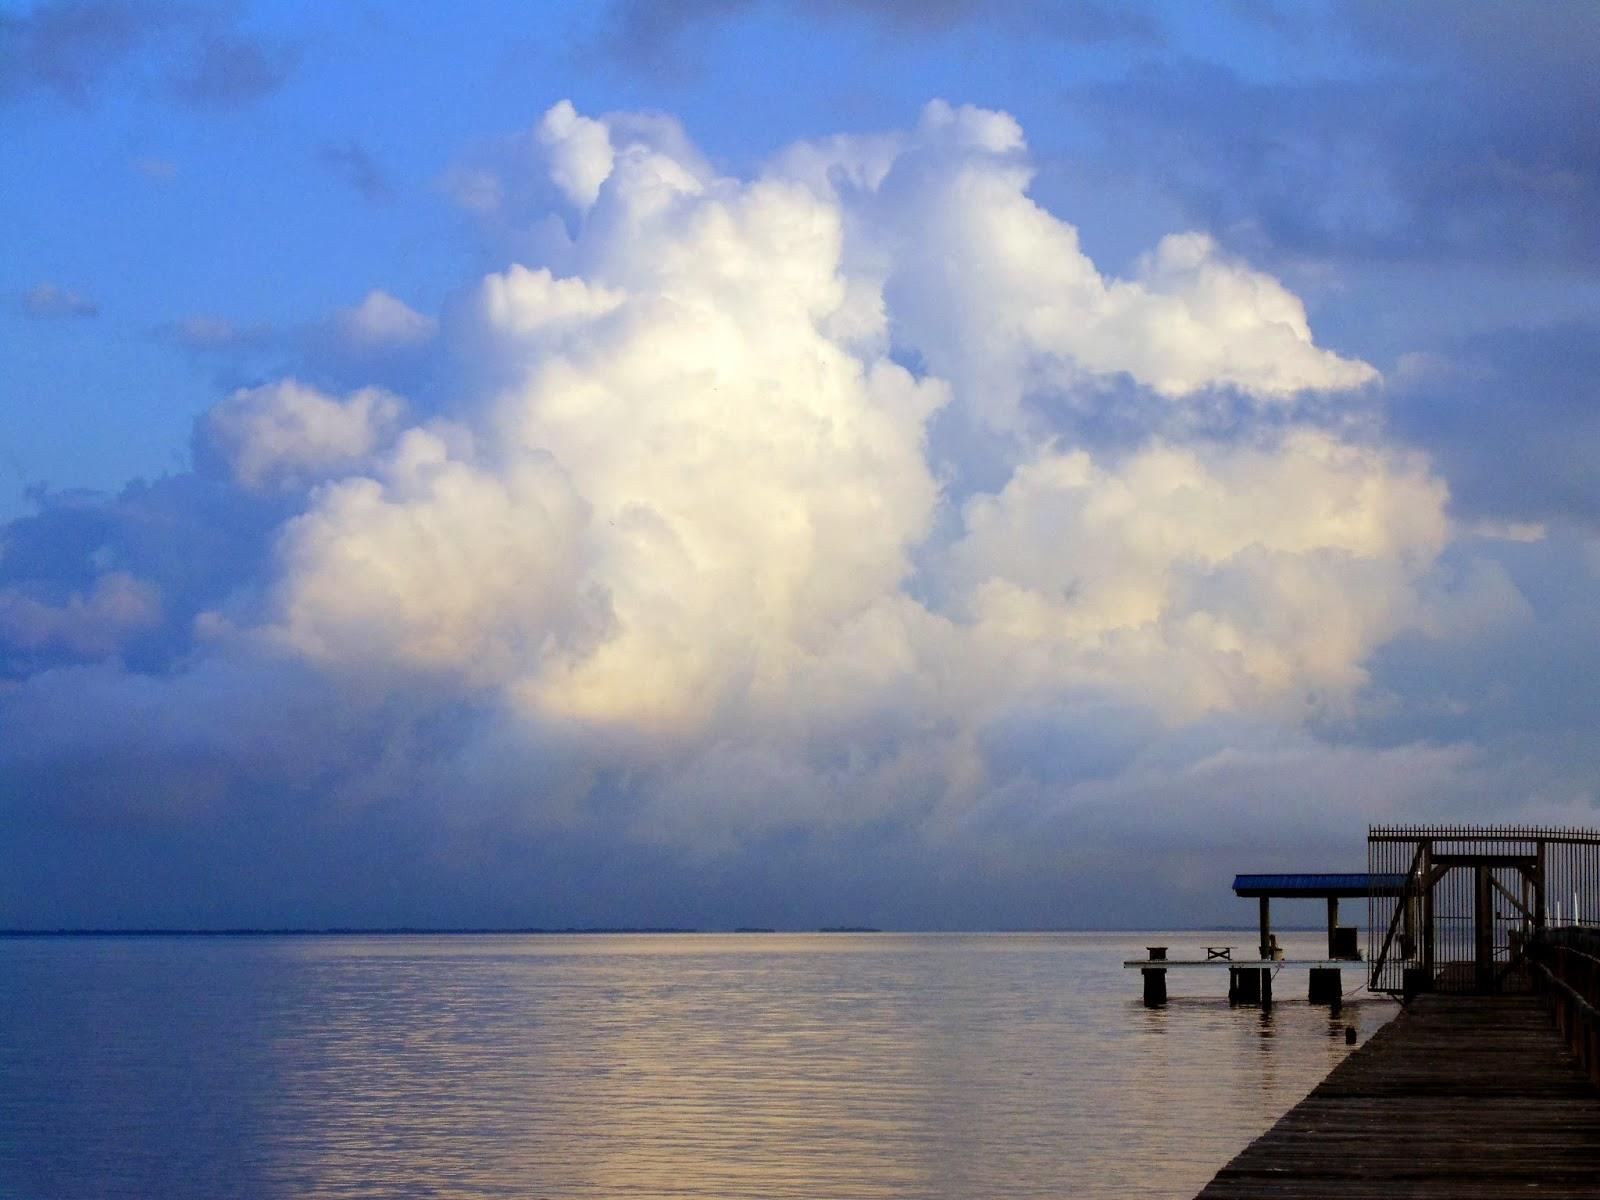 Pine island florida blueway festival this weekend for Bokeelia fishing pier